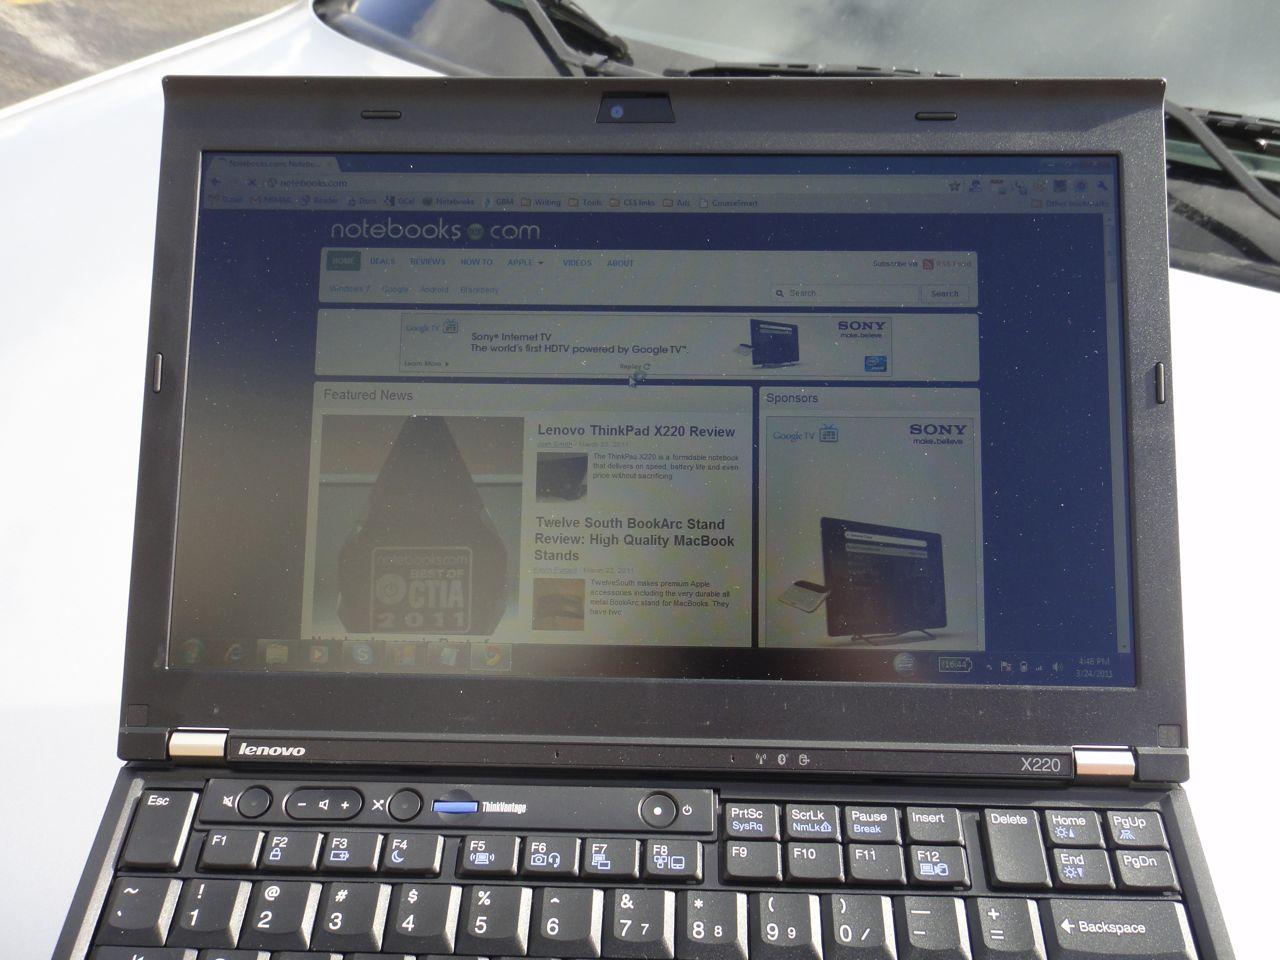 Lenovo ThinkPad X220 Review